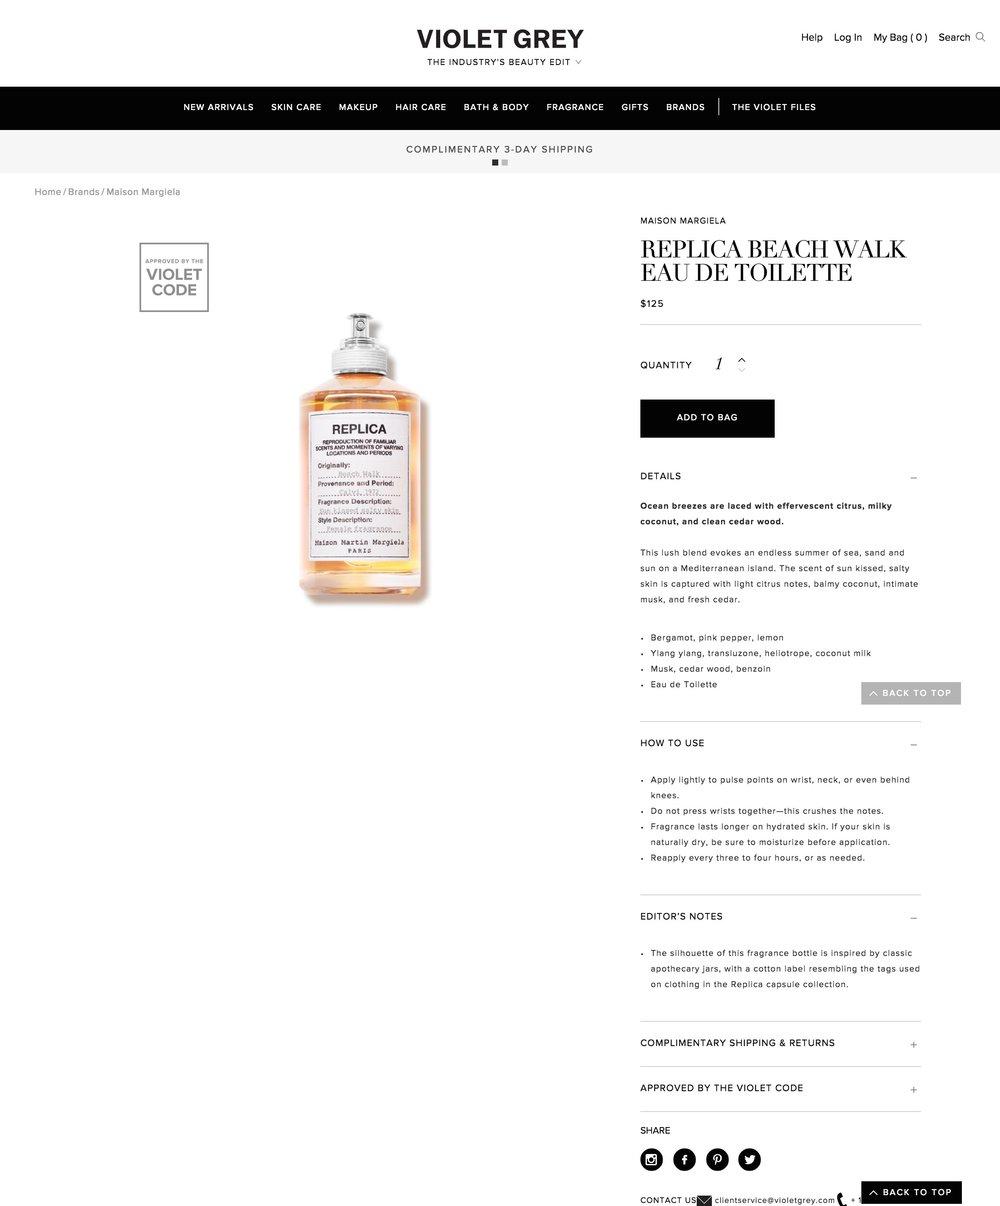 screencapture-violetgrey-product-replica-beach-walk-eau-de-toilette-MMA-L36871-1487191217028.jpg